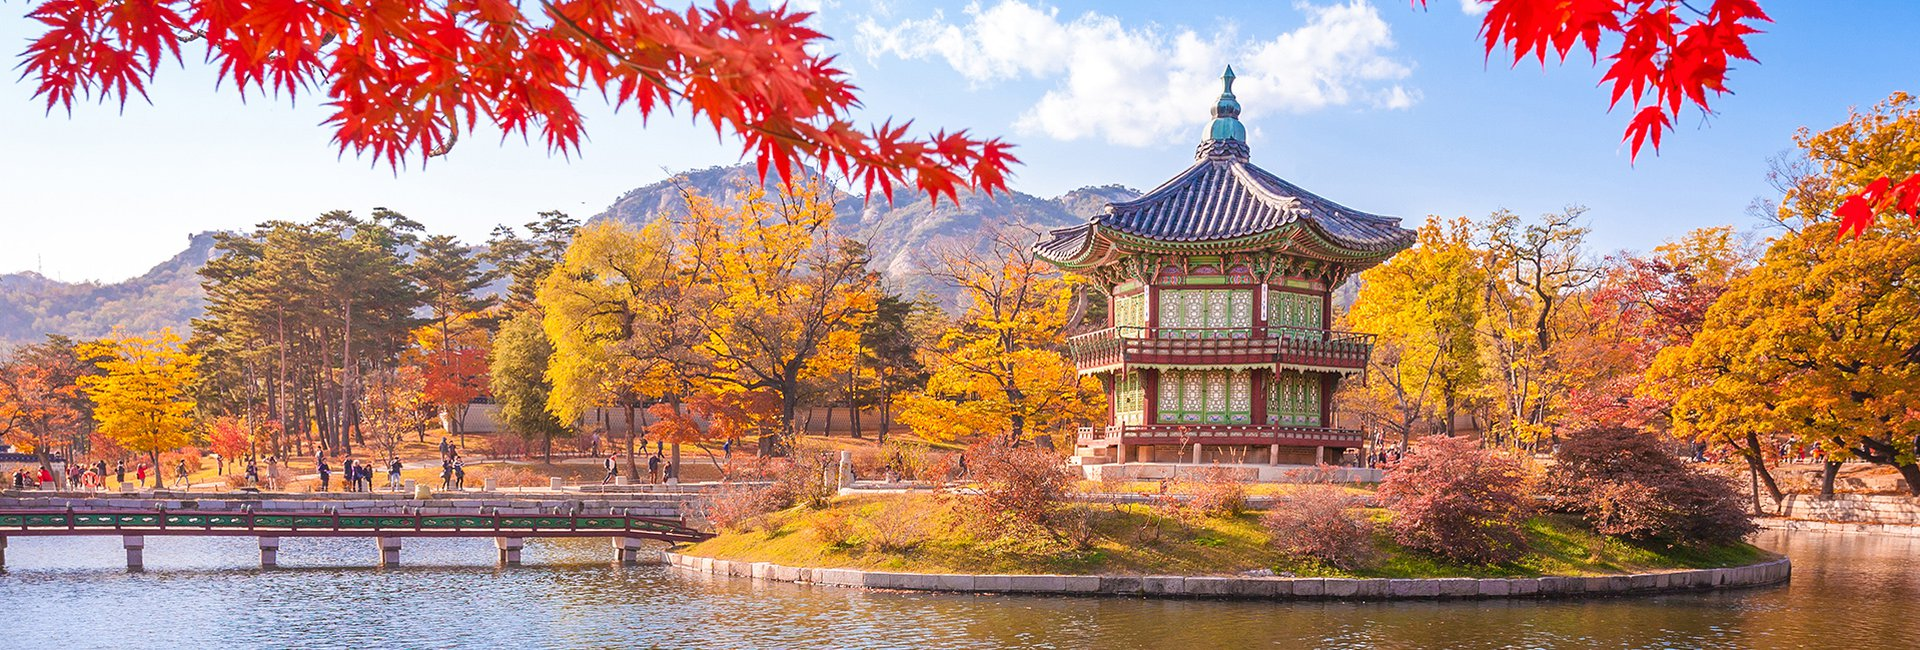 Top 20 địa điểm du lịch hấp dẫn tại Seoul